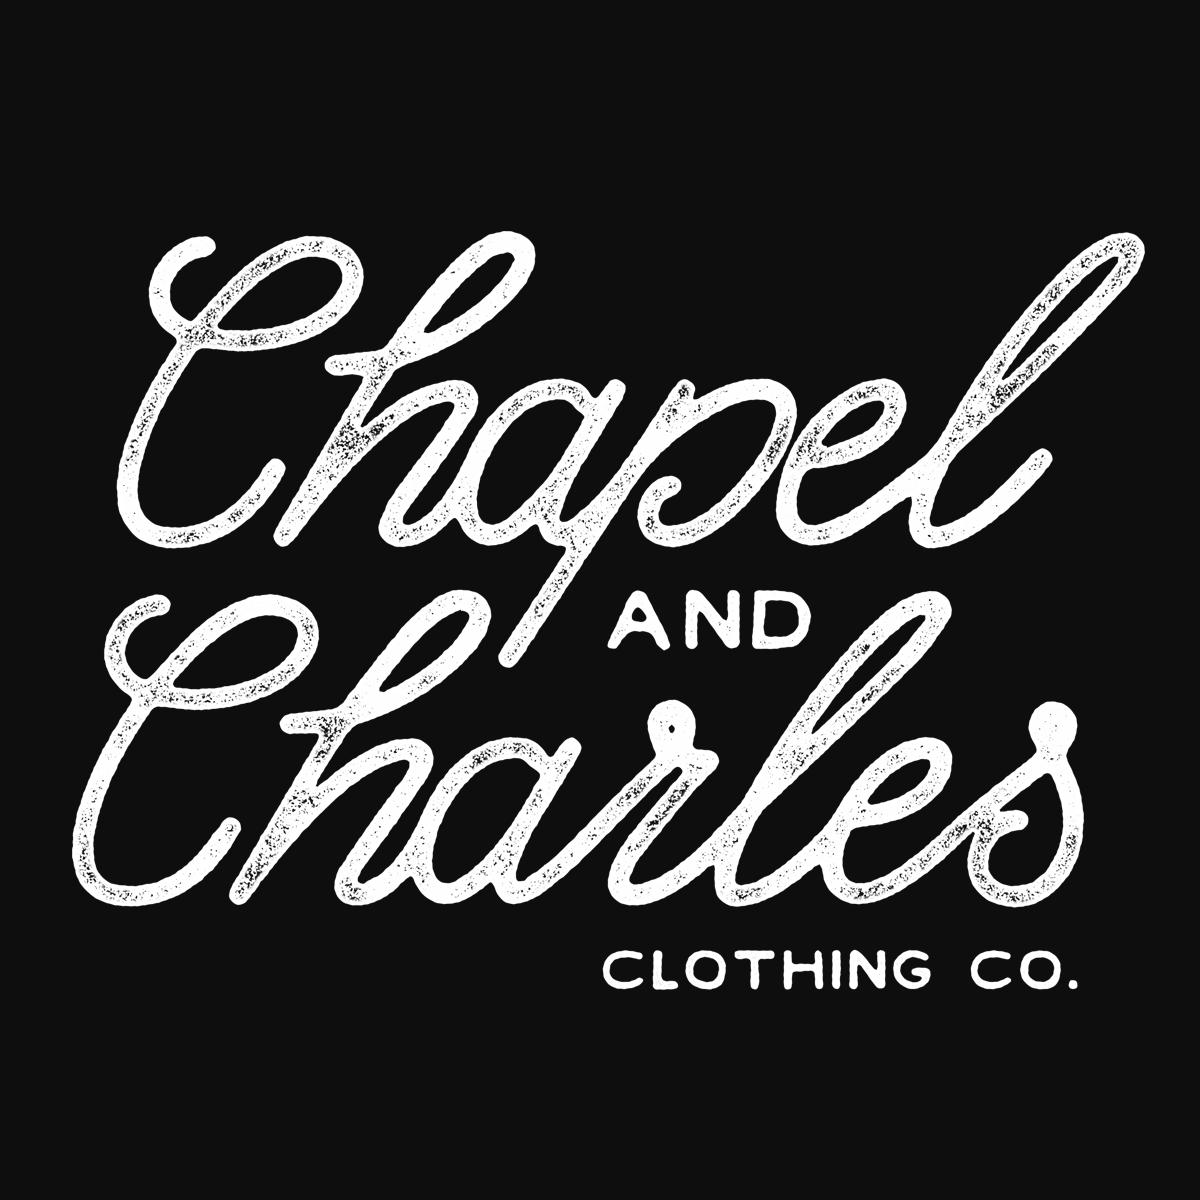 Chapel & Charles Co. Logos & Apparel Designs